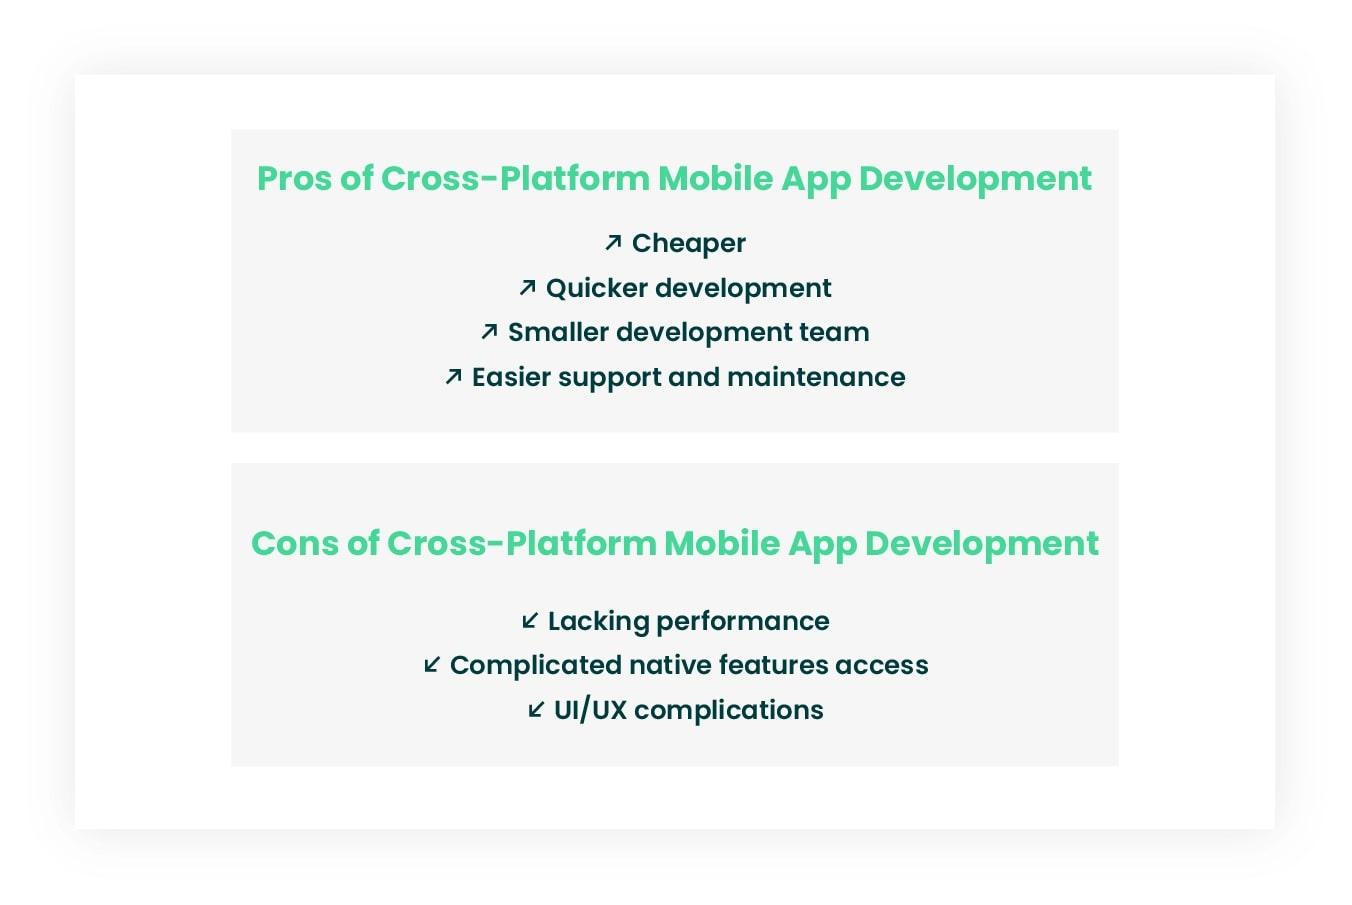 Pros and Cons of Cross-Platform App Development infographic